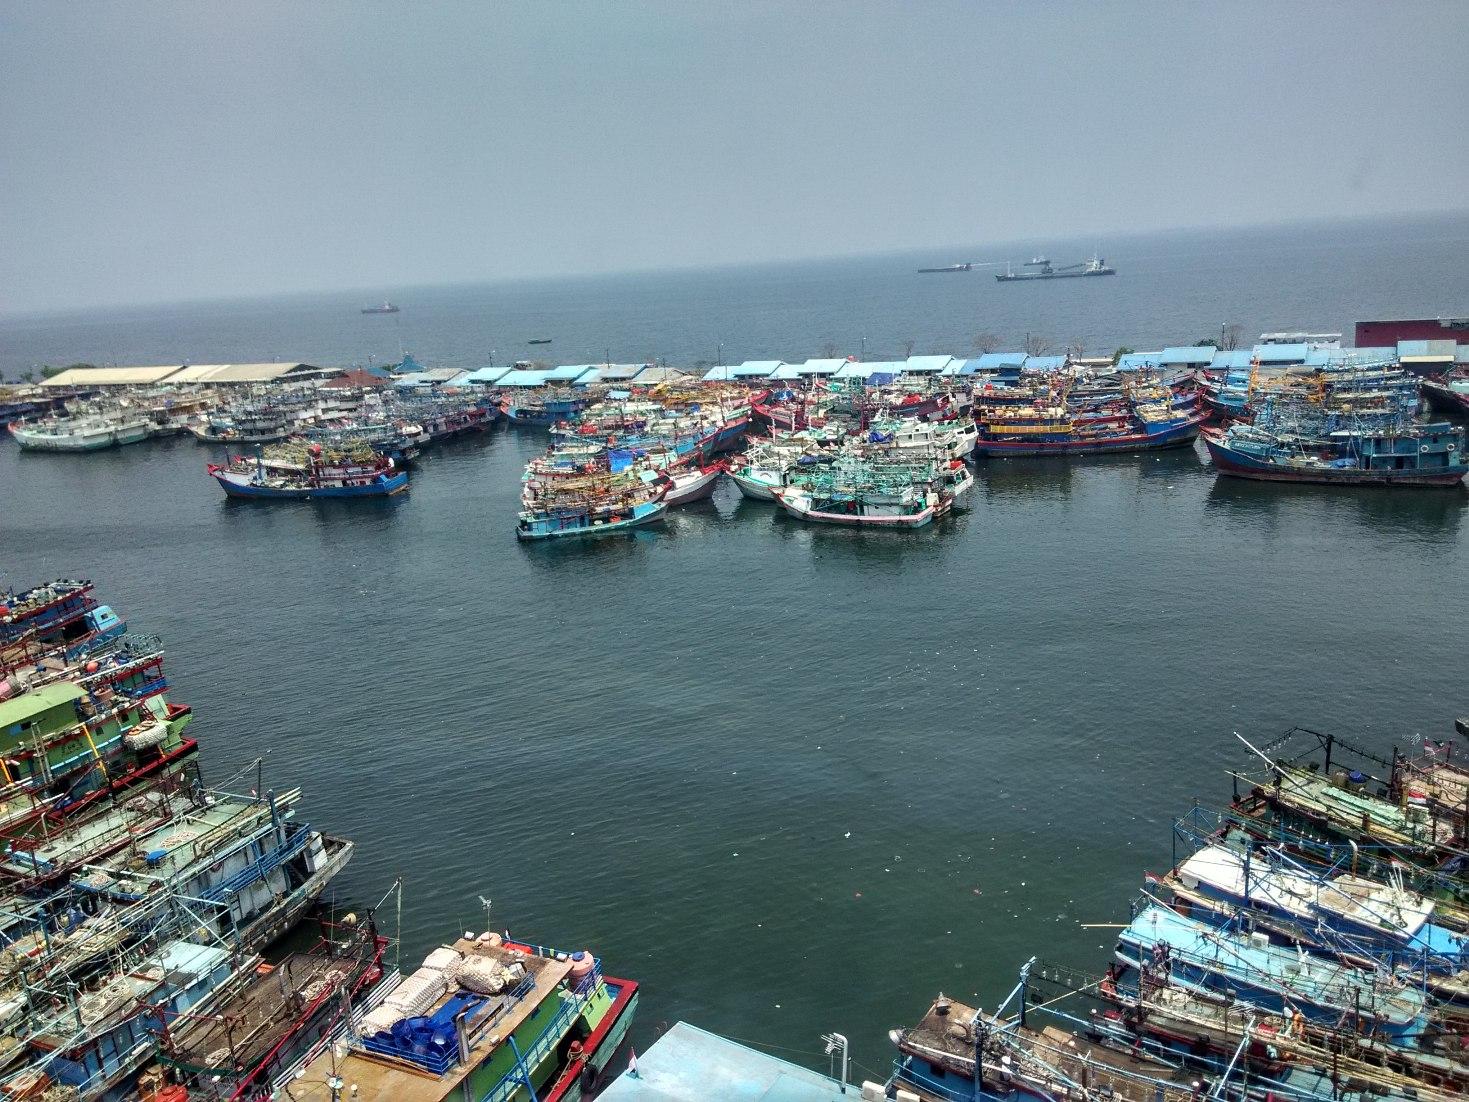 Dozens of grounded boats at Jakarta's Muara Baru port in January. Photo by M Ambari/Mongabay